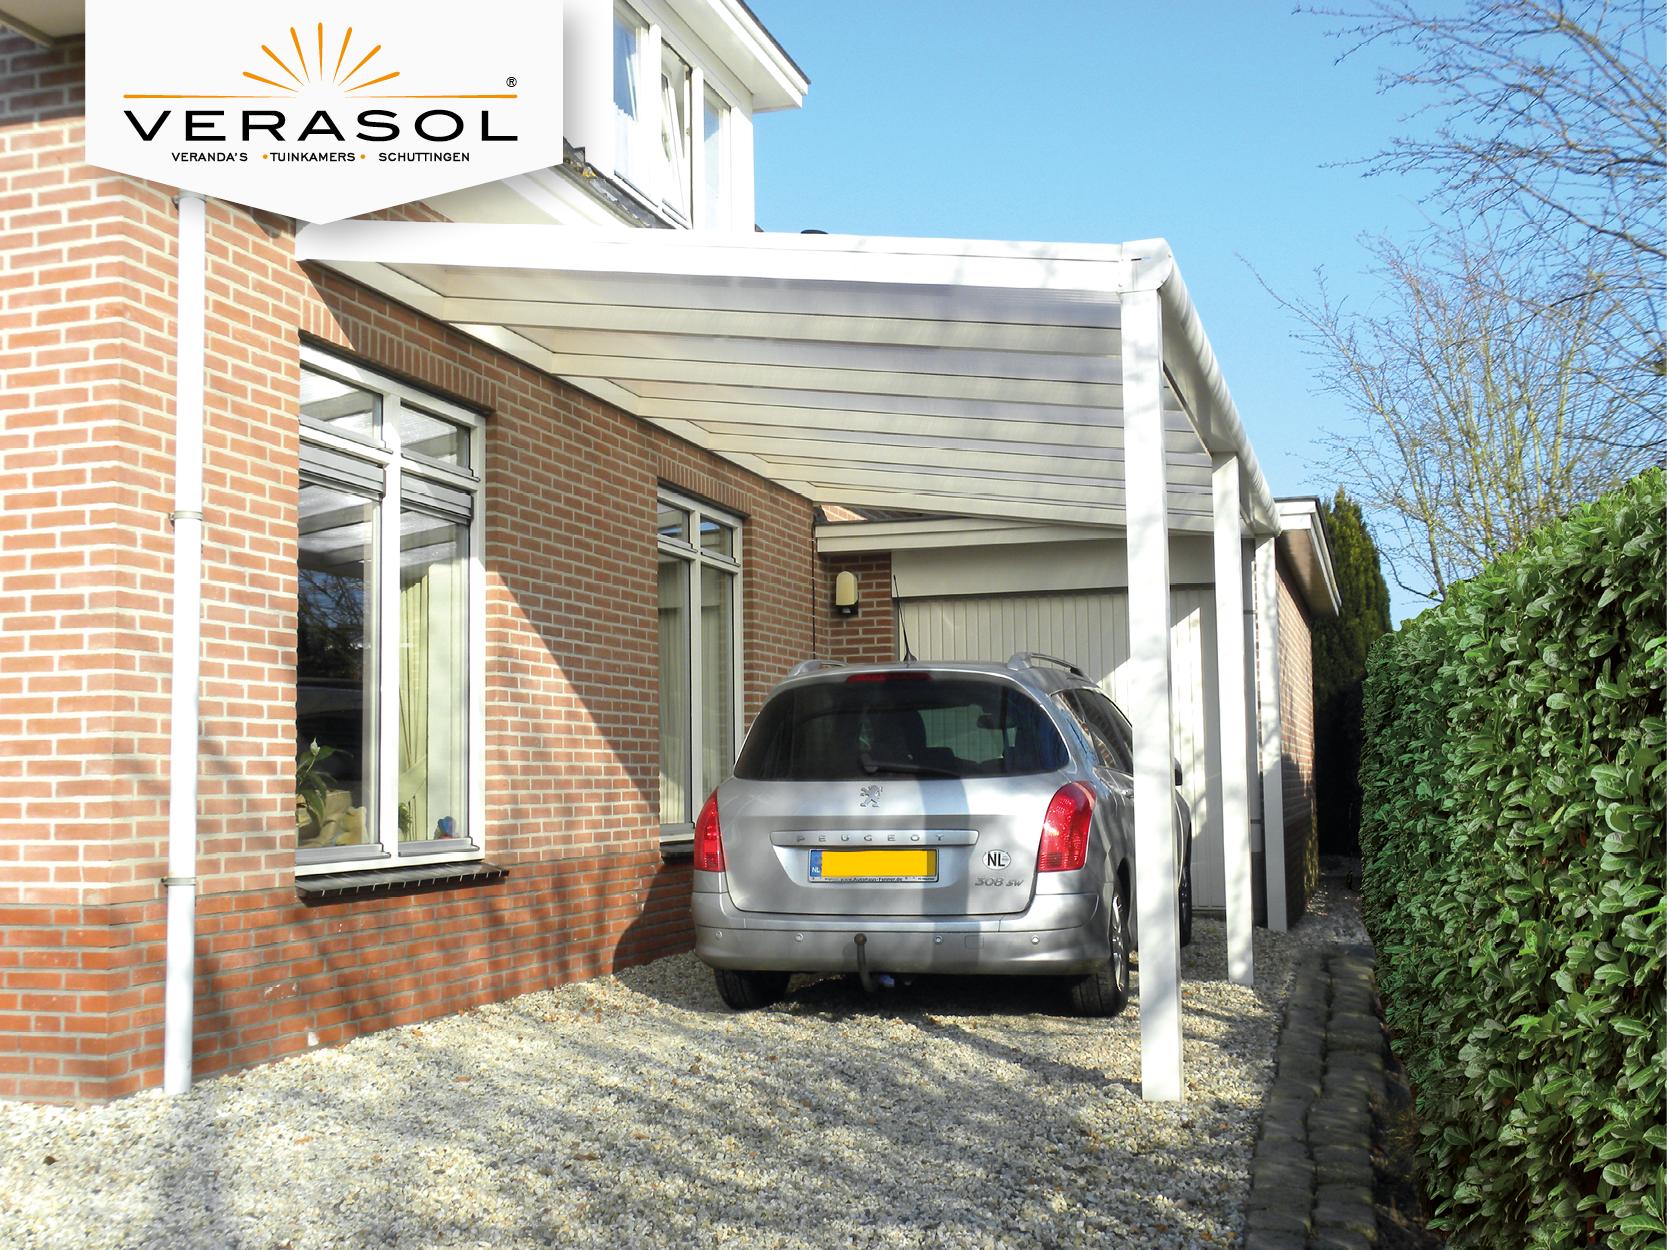 Closing in a carport to make guest suite - Verasol Carport